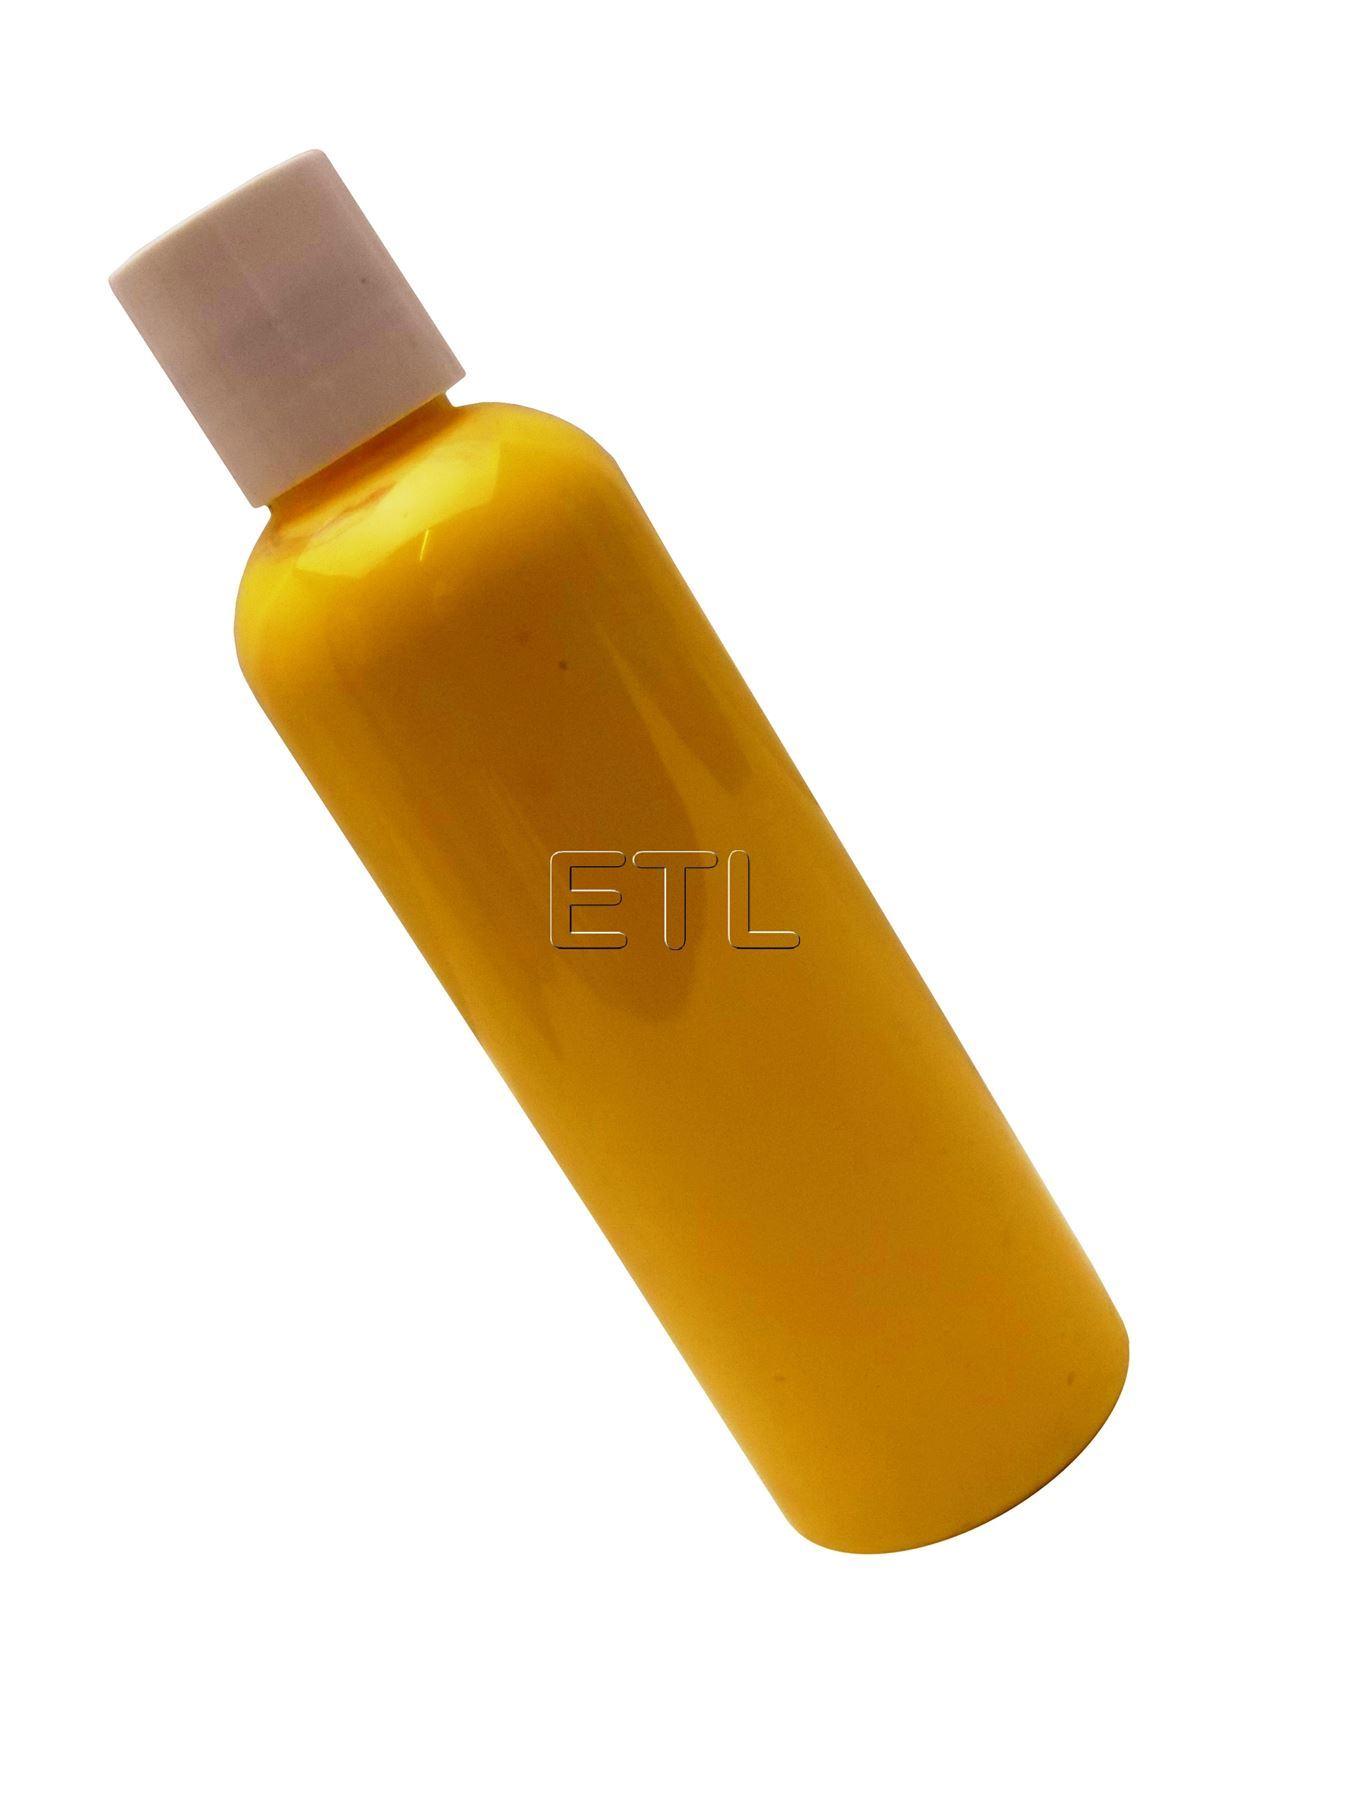 Non toxic craft paint - 200ml Yellow Craft Paint Bottle Pot Non Toxic Art Children Kids School Party